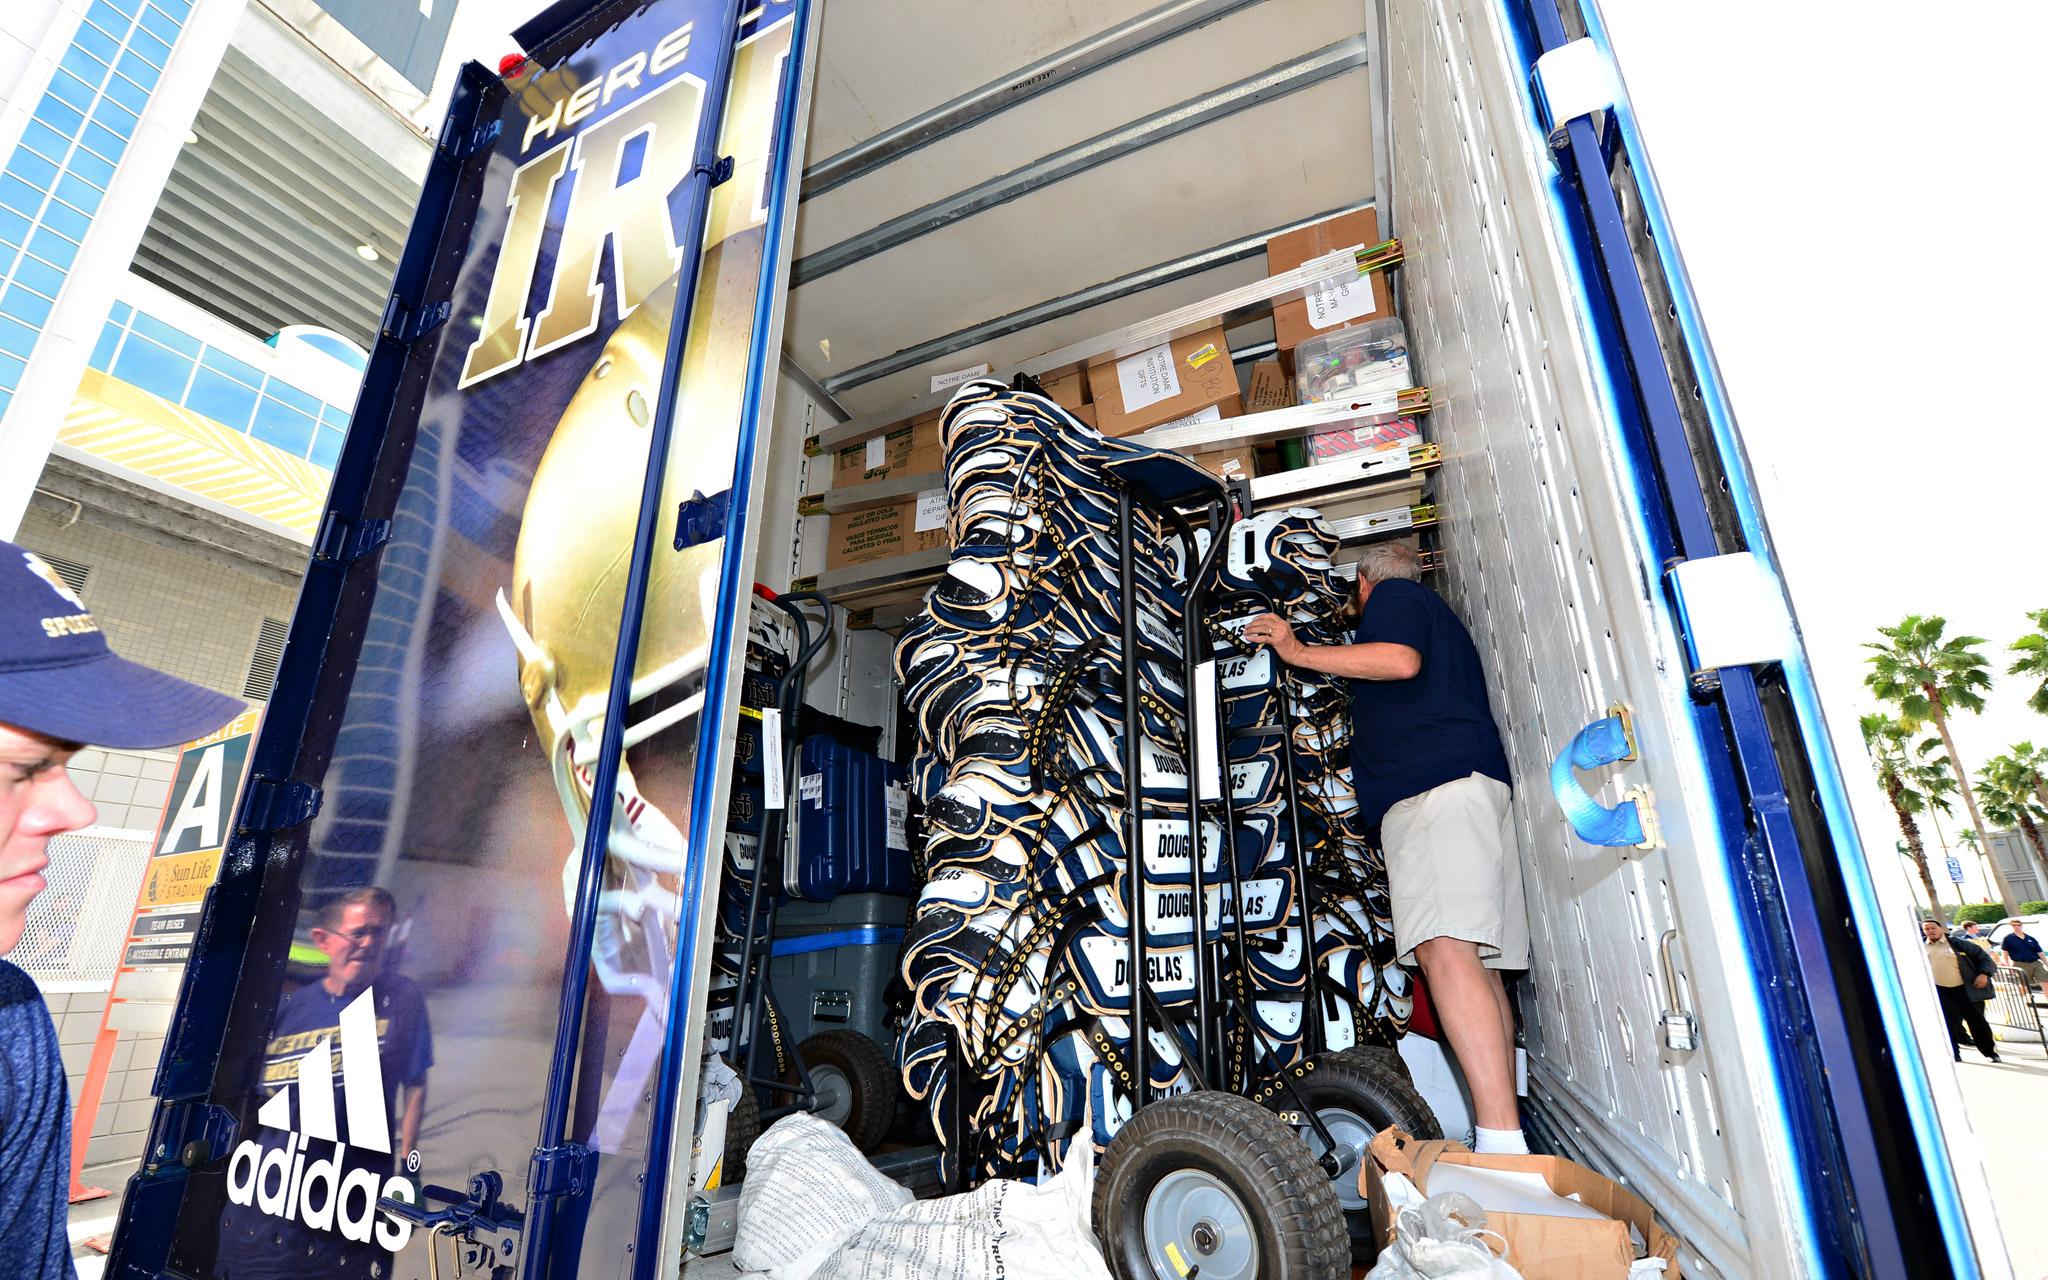 Notre Dame equipment truck